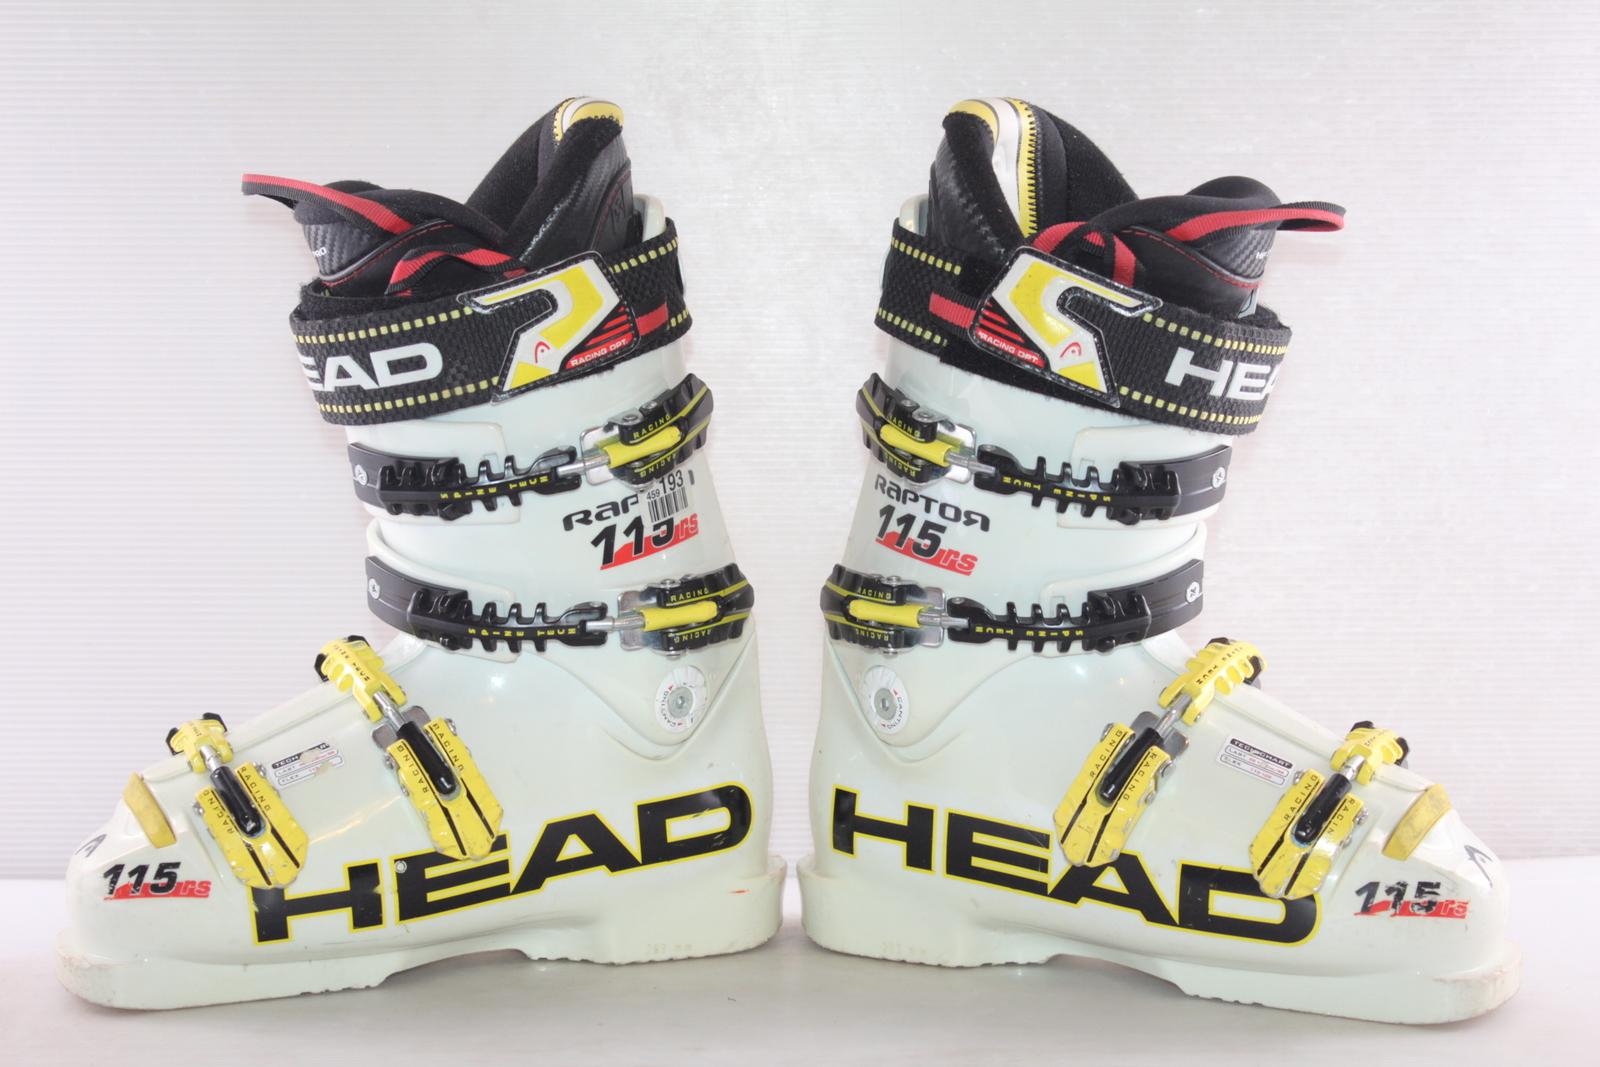 Lyžařské boty Head Raptor 115 RS vel. EU38 flexe 115